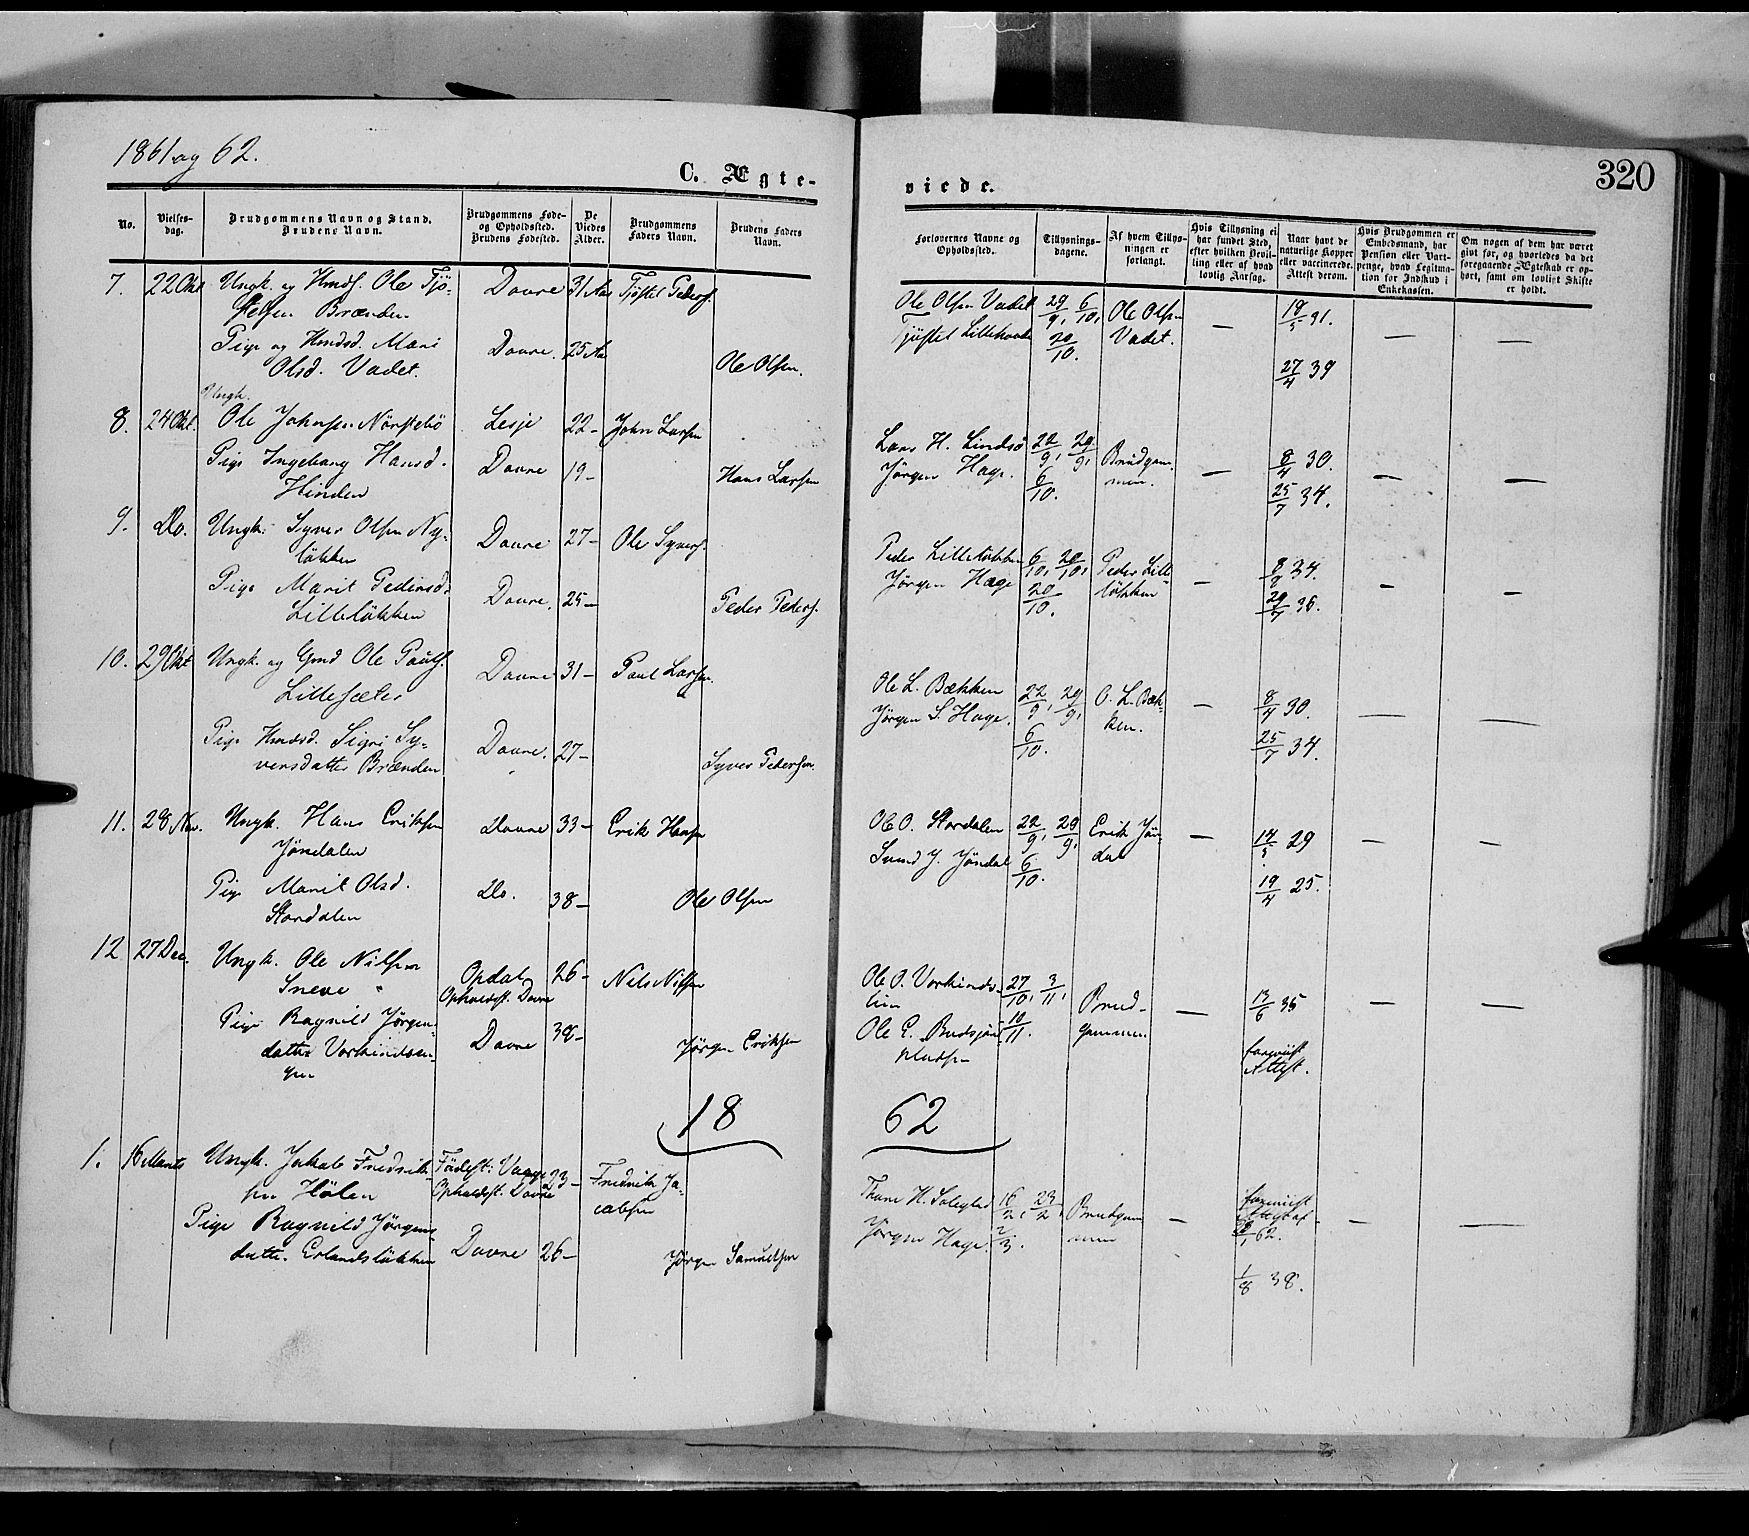 SAH, Dovre prestekontor, Ministerialbok nr. 1, 1854-1878, s. 320